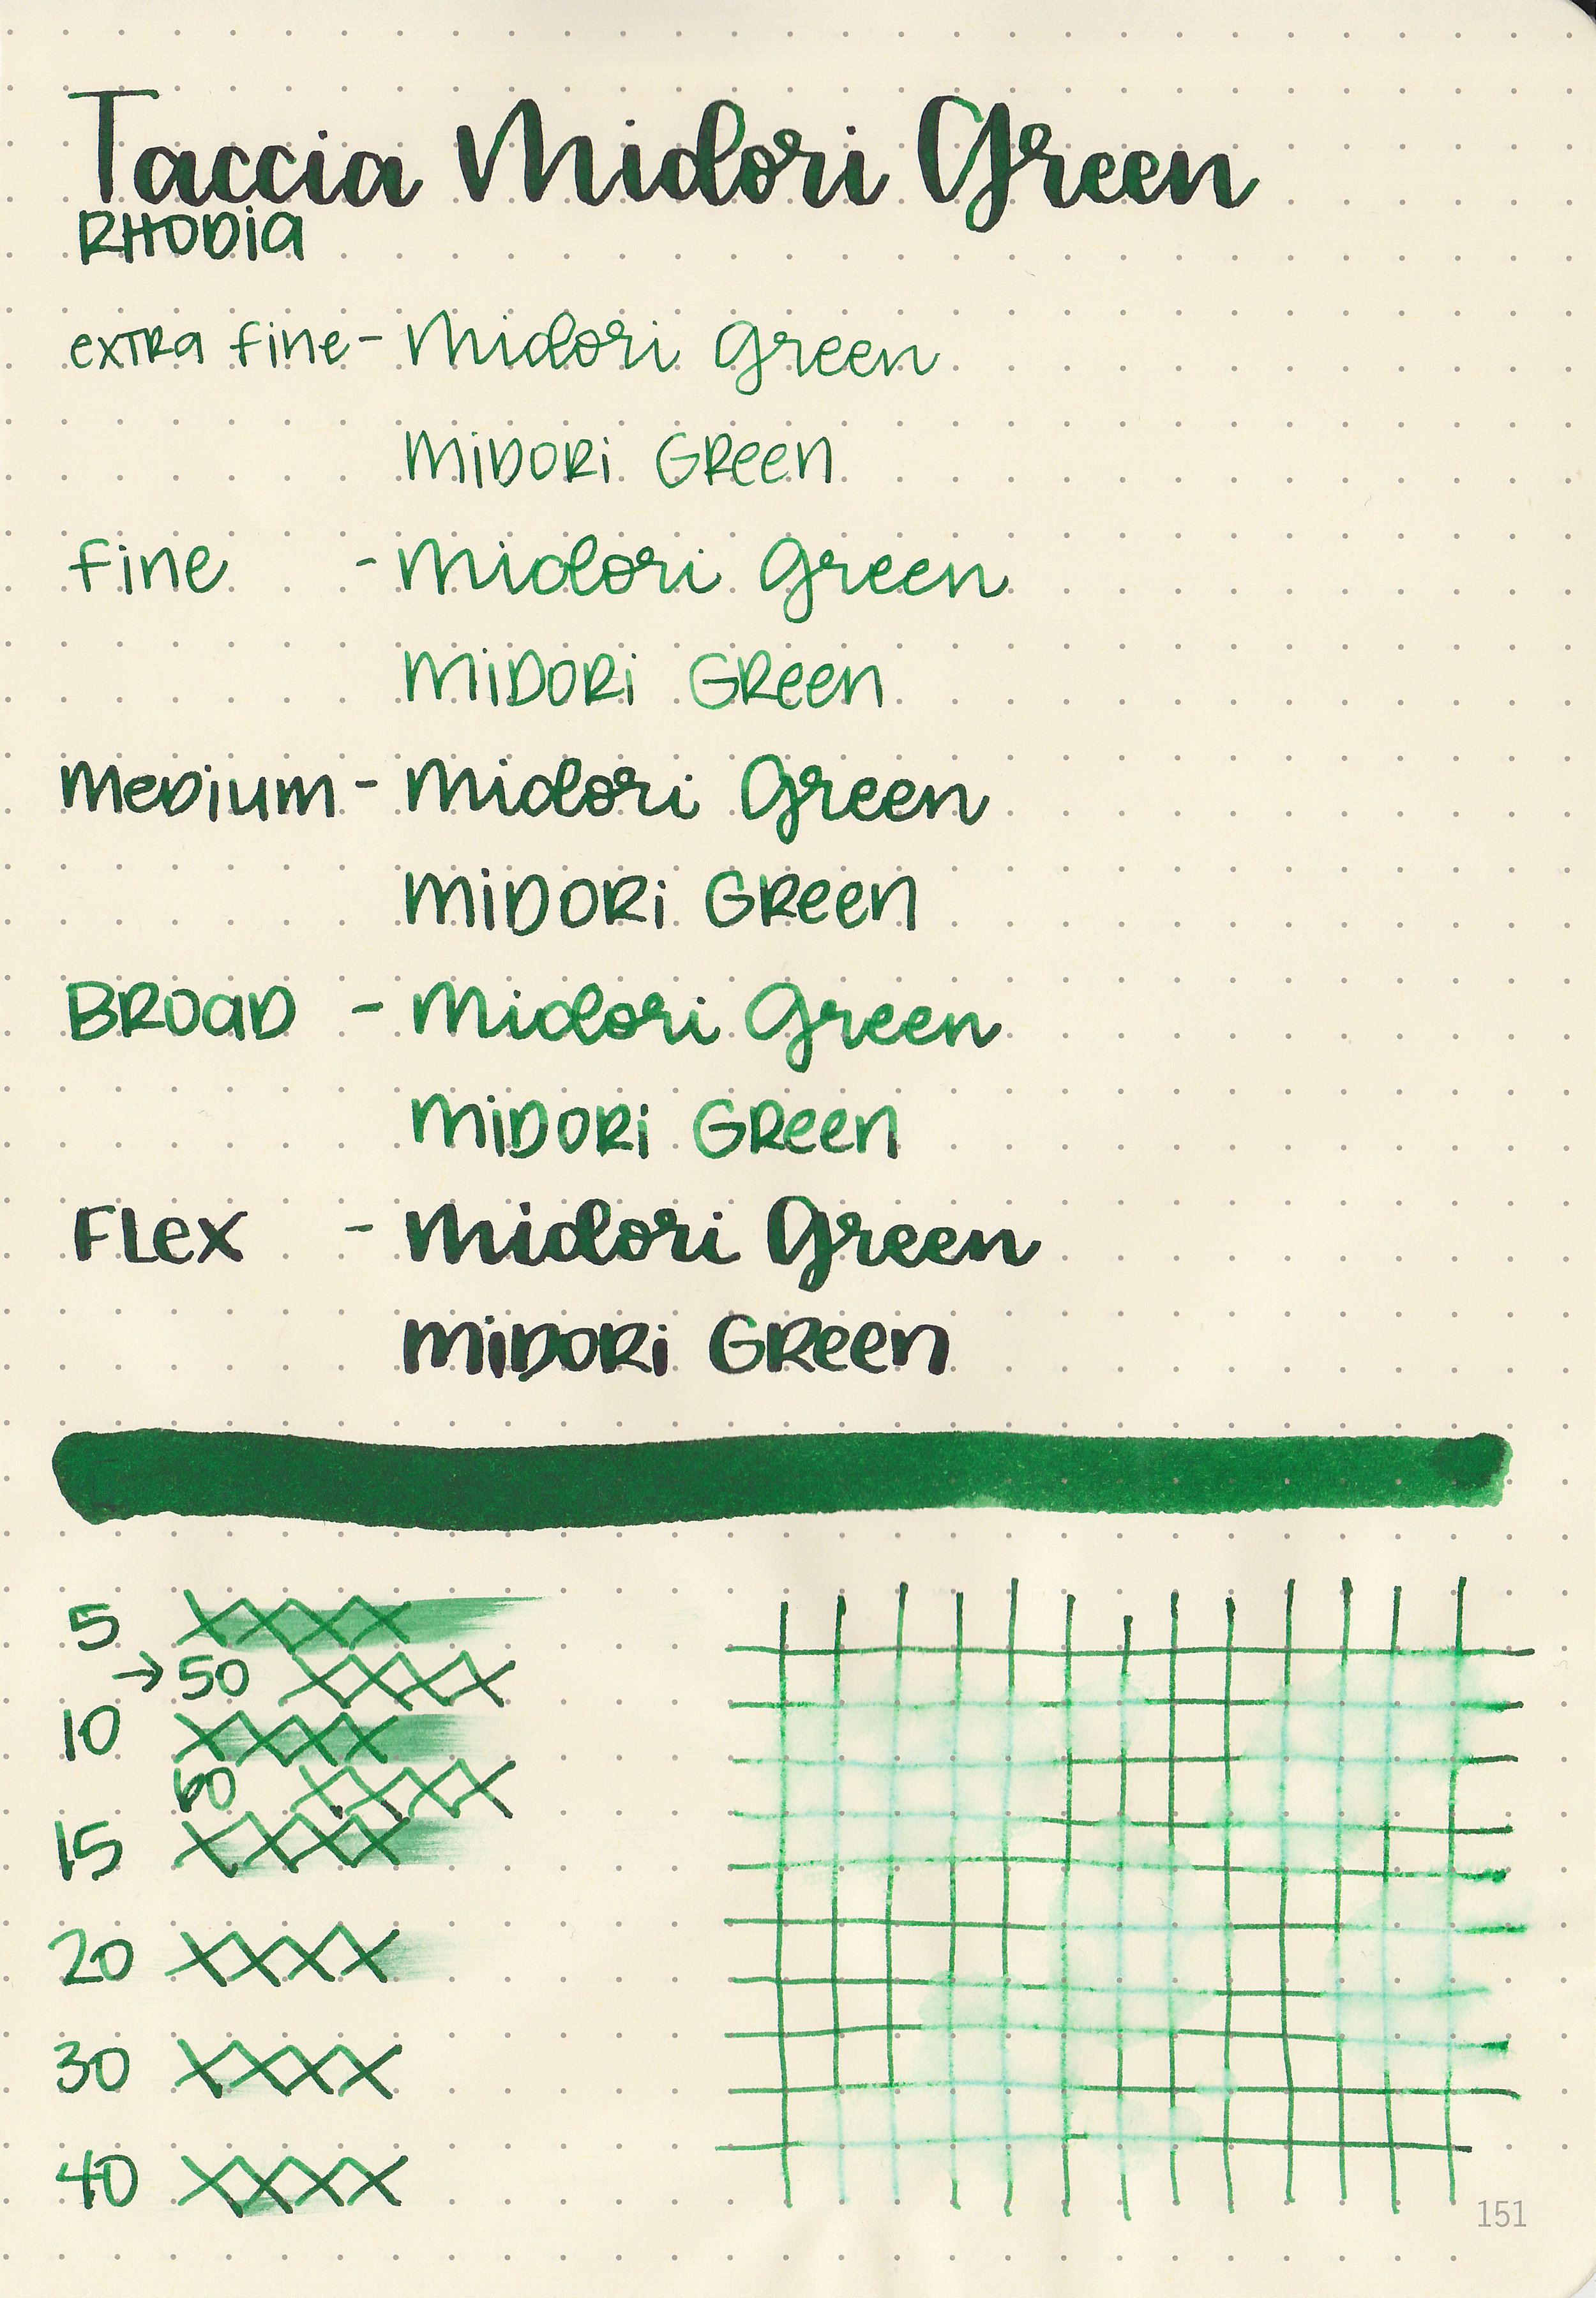 tac-midori-green-5.jpg